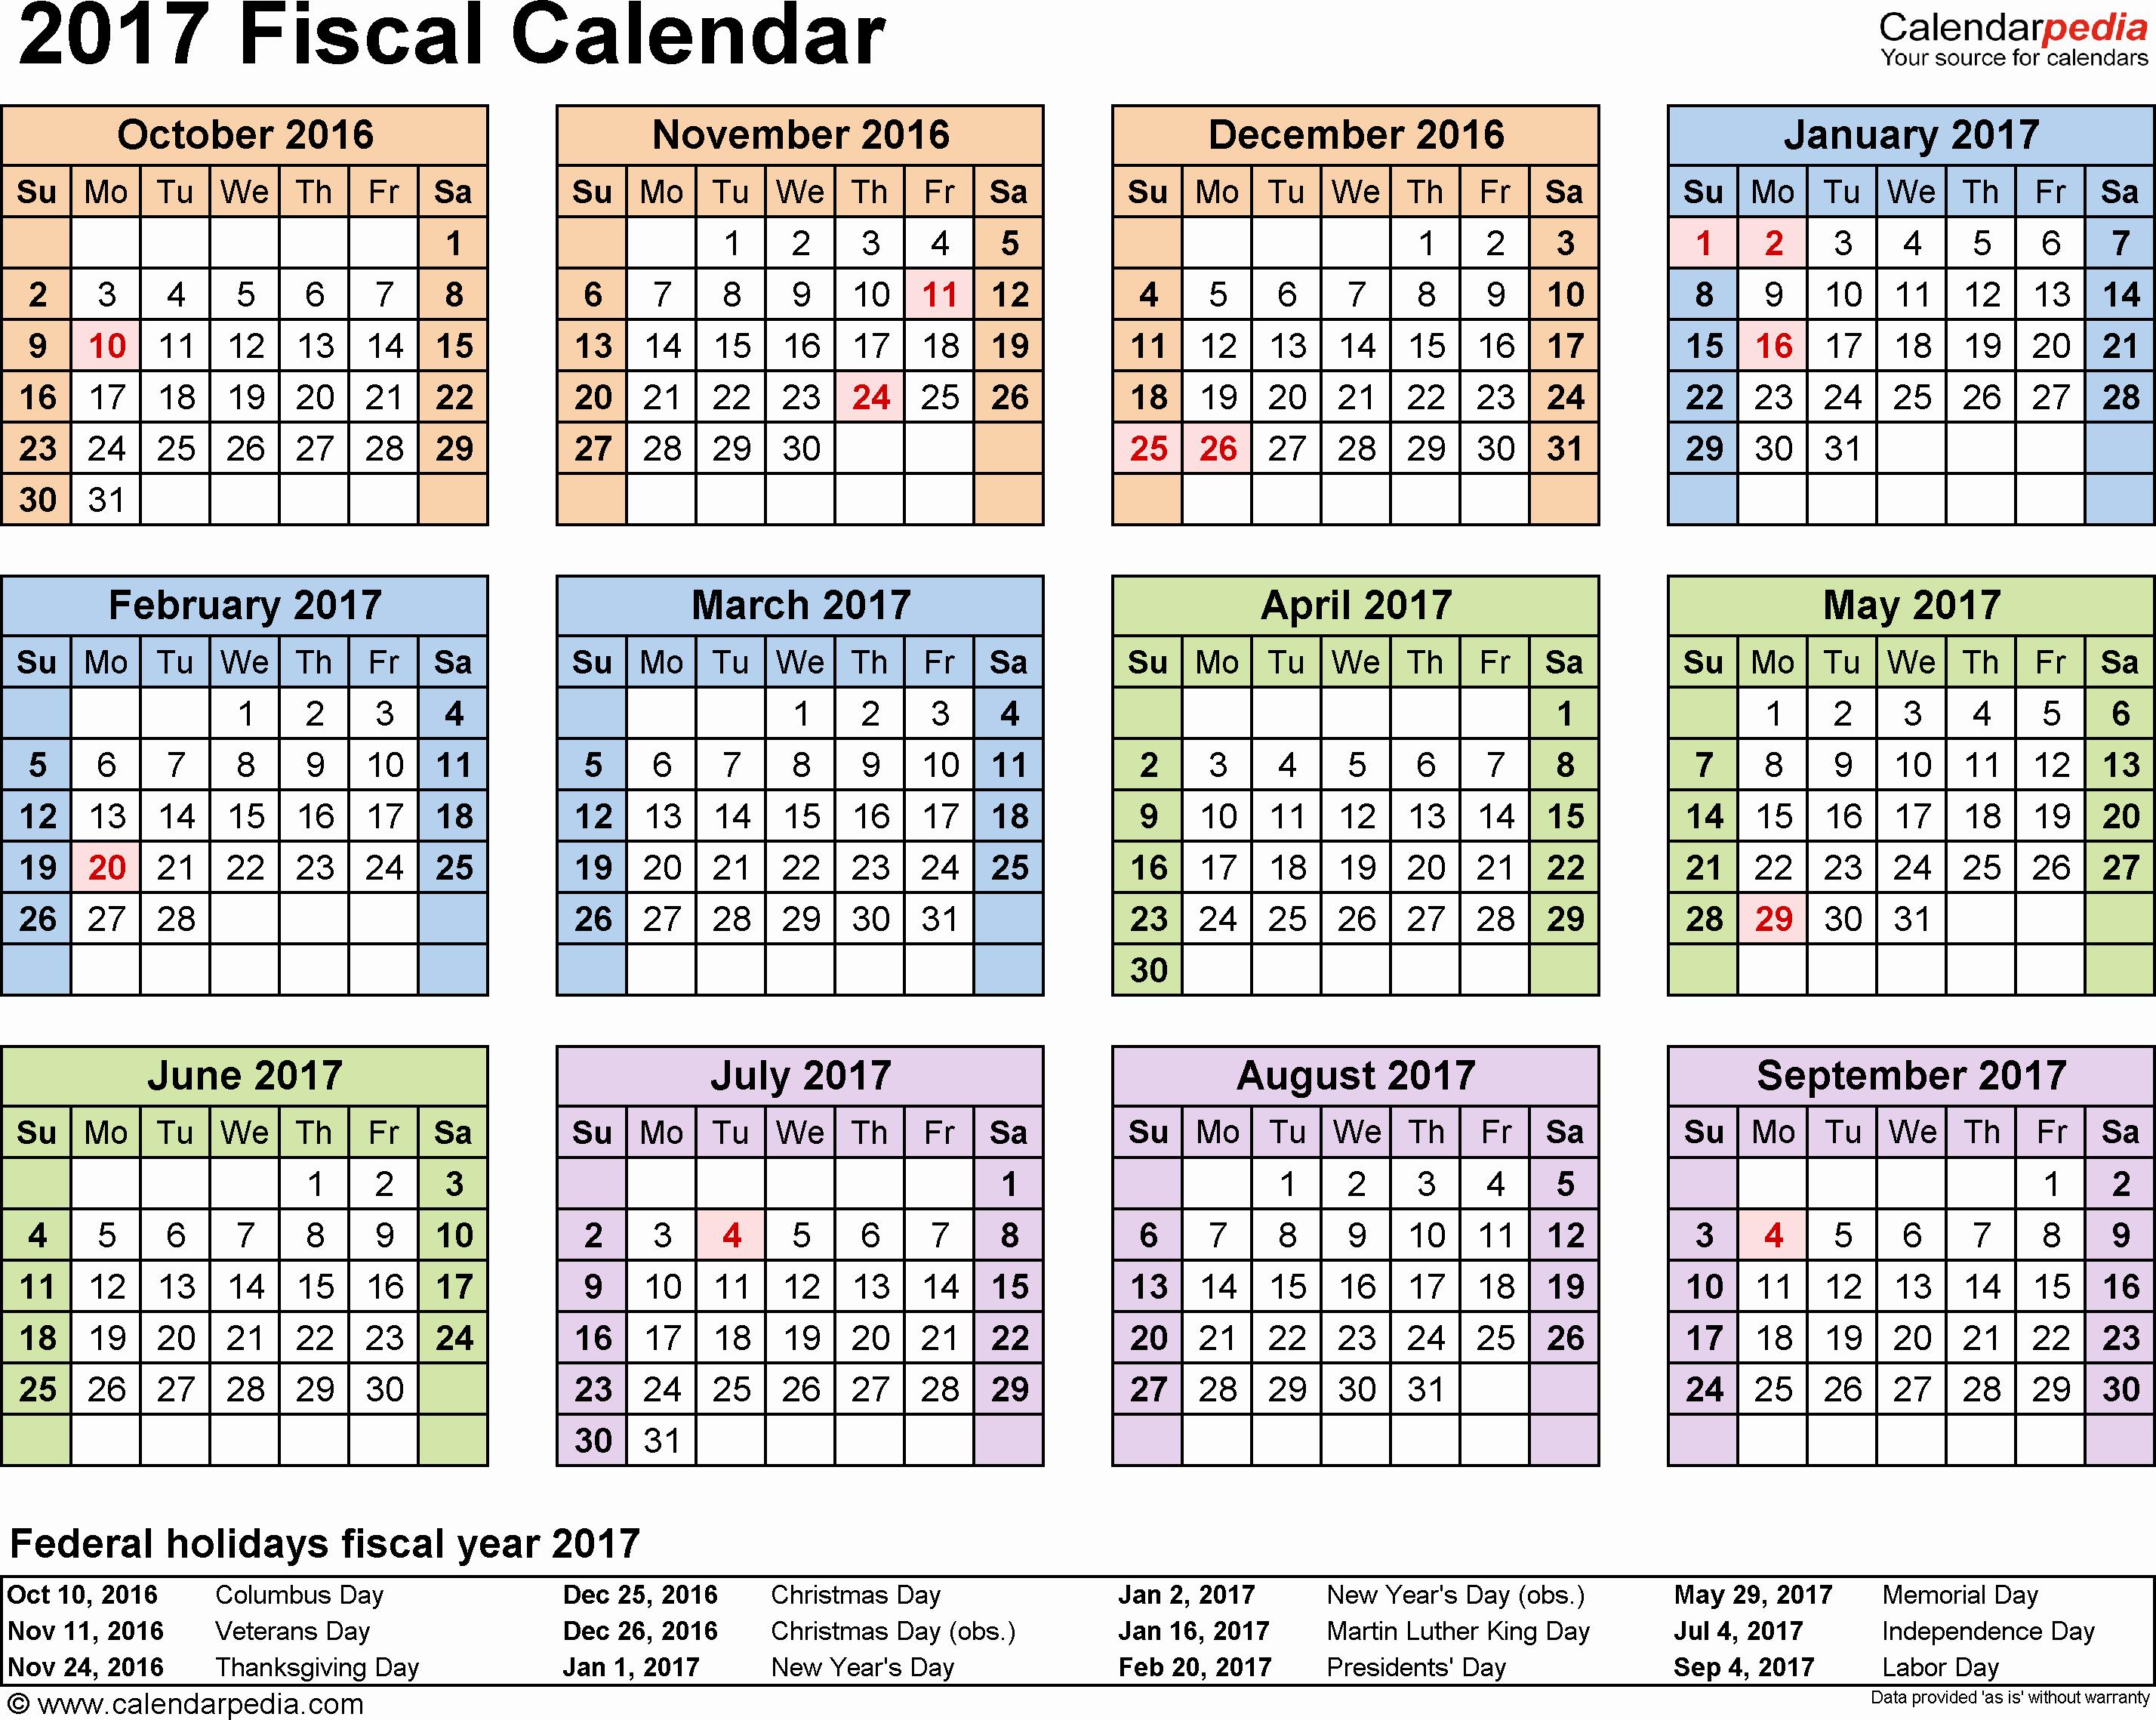 Calendar 2016-17 Template Fresh Fiscal Calendars 2017 as Free Printable Excel Templates